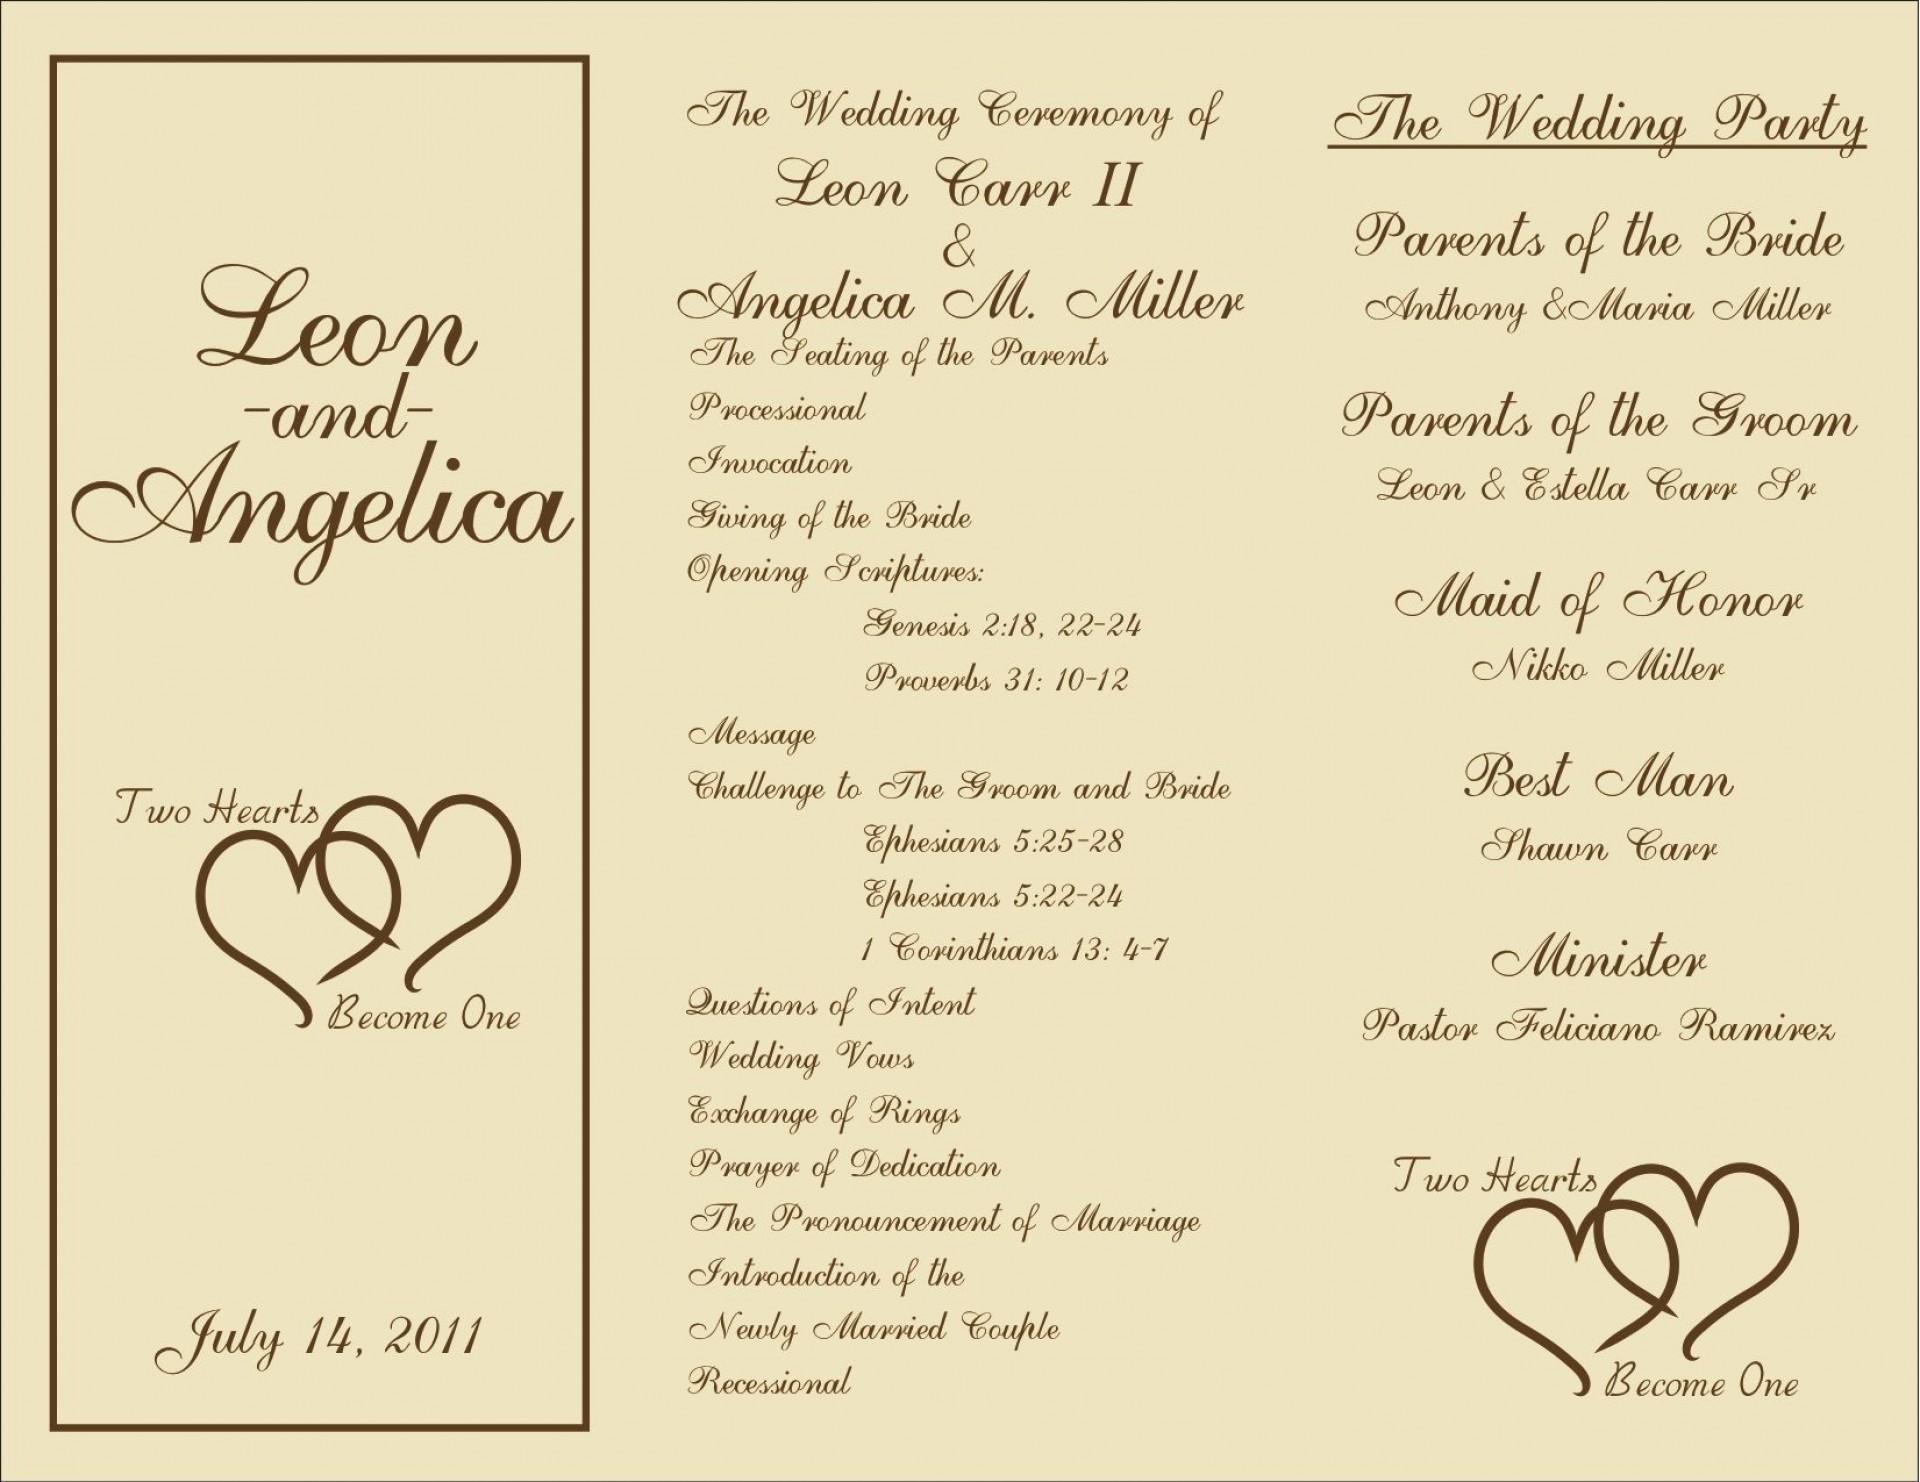 005 Unforgettable Wedding Program Template Free Download Inspiration  Downloadable Pdf Reception Microsoft Word Fan1920